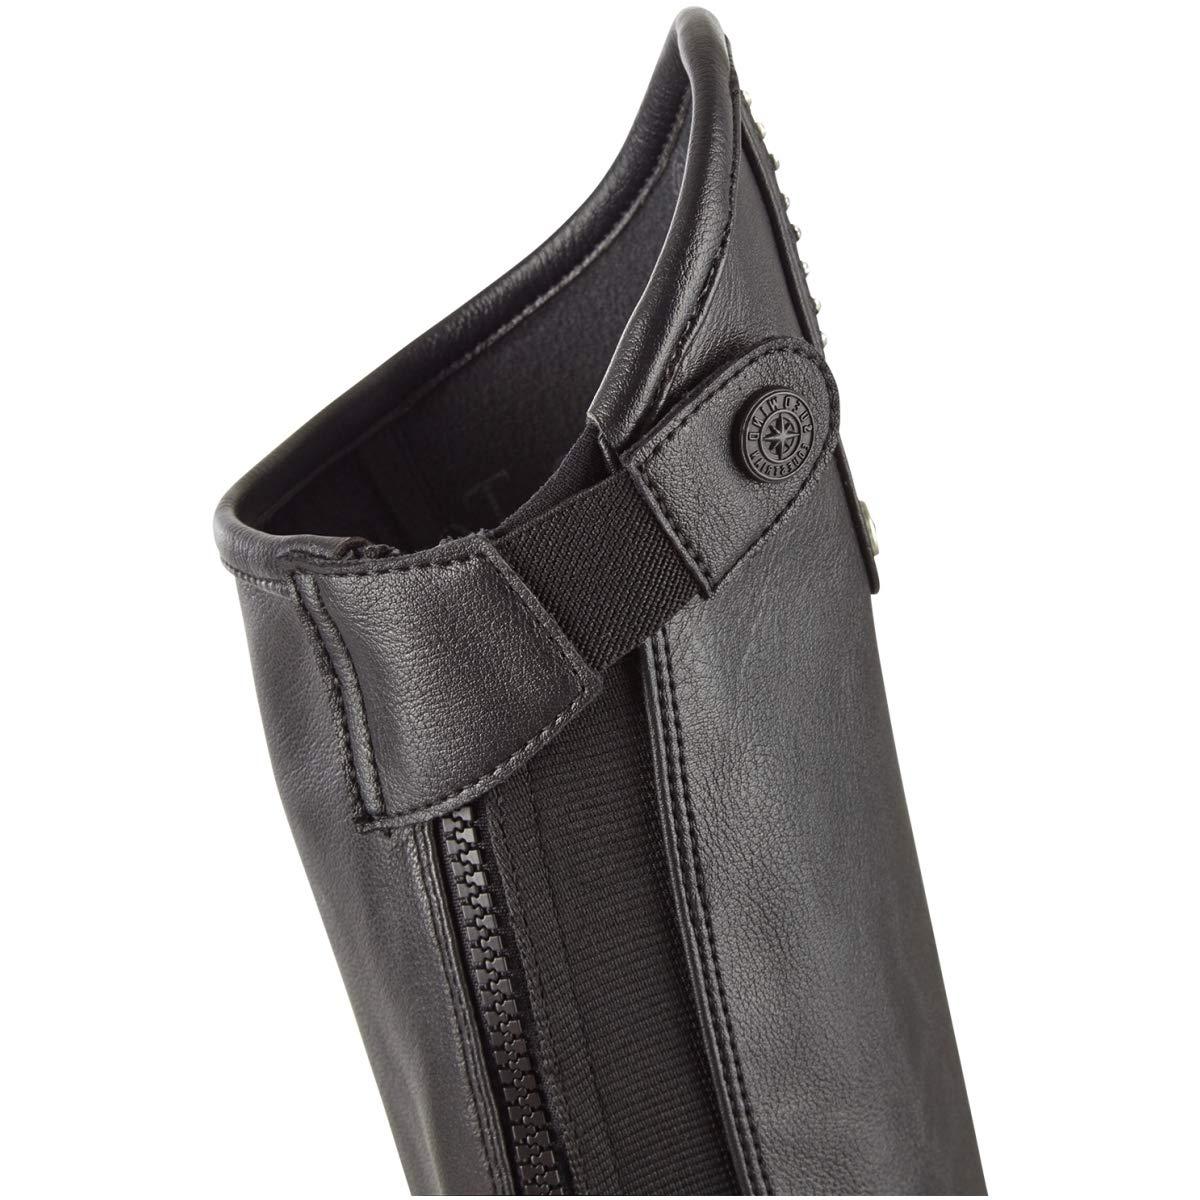 SUEDWIND Damen Minichaps Leder Comfort Comfort Comfort Soft Glitter schwarz W35-39 L51 - LXT 992158